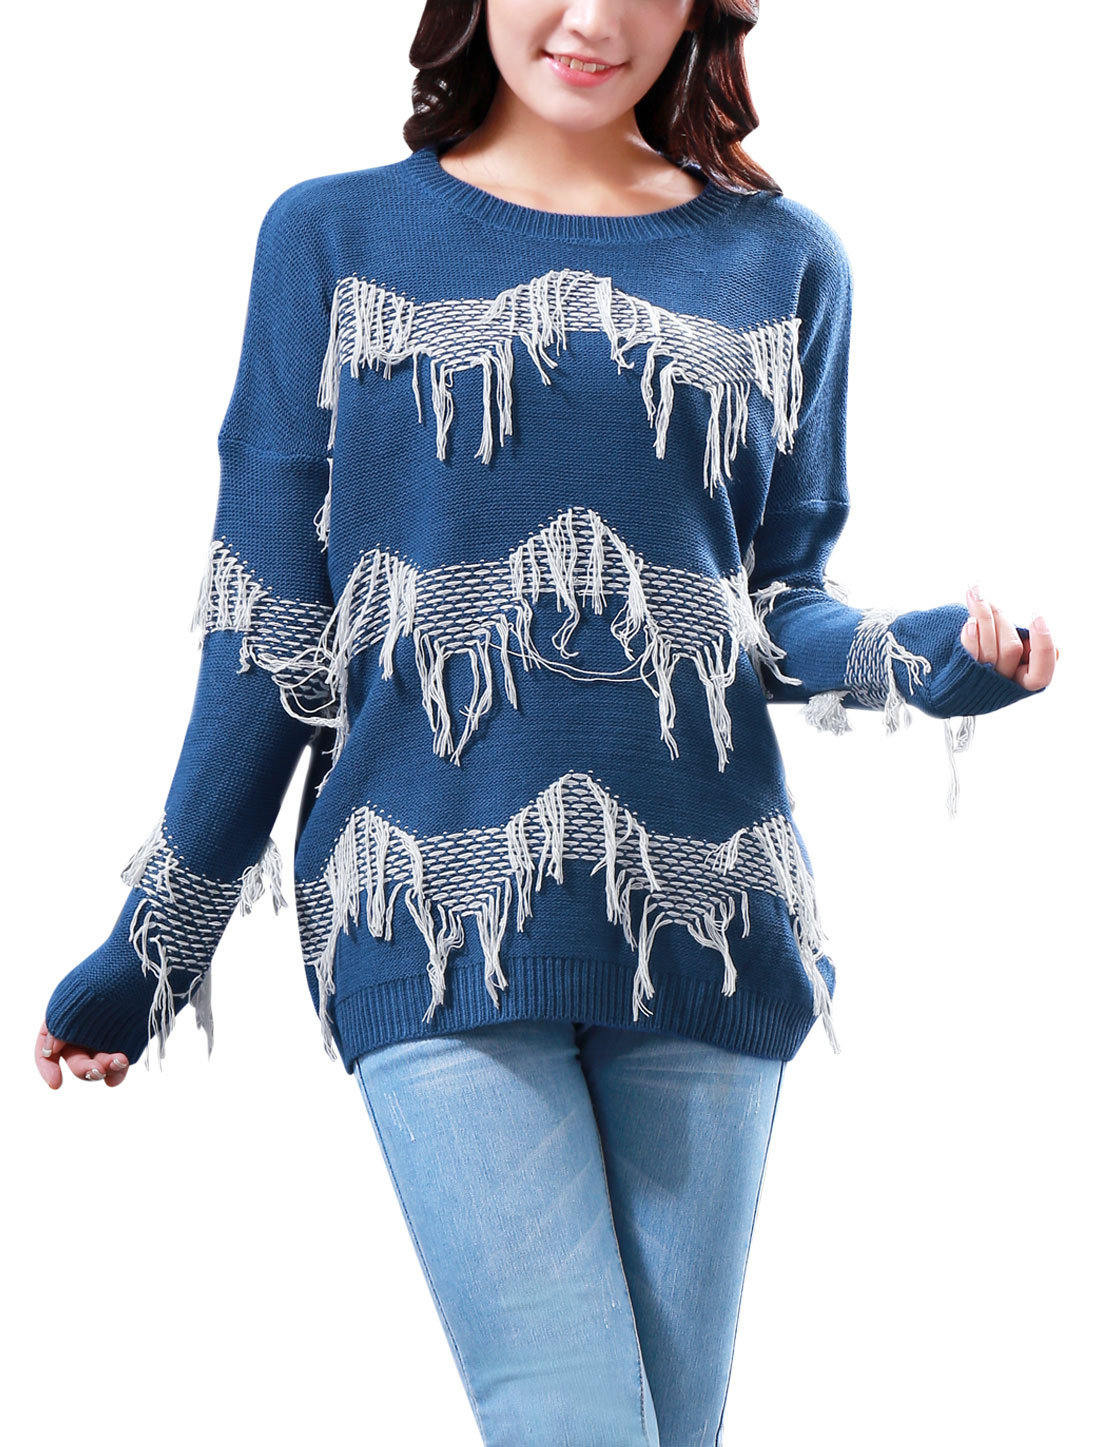 Lady Pullover Tassel Trim Design Fashion Sweater Sky Blue White S